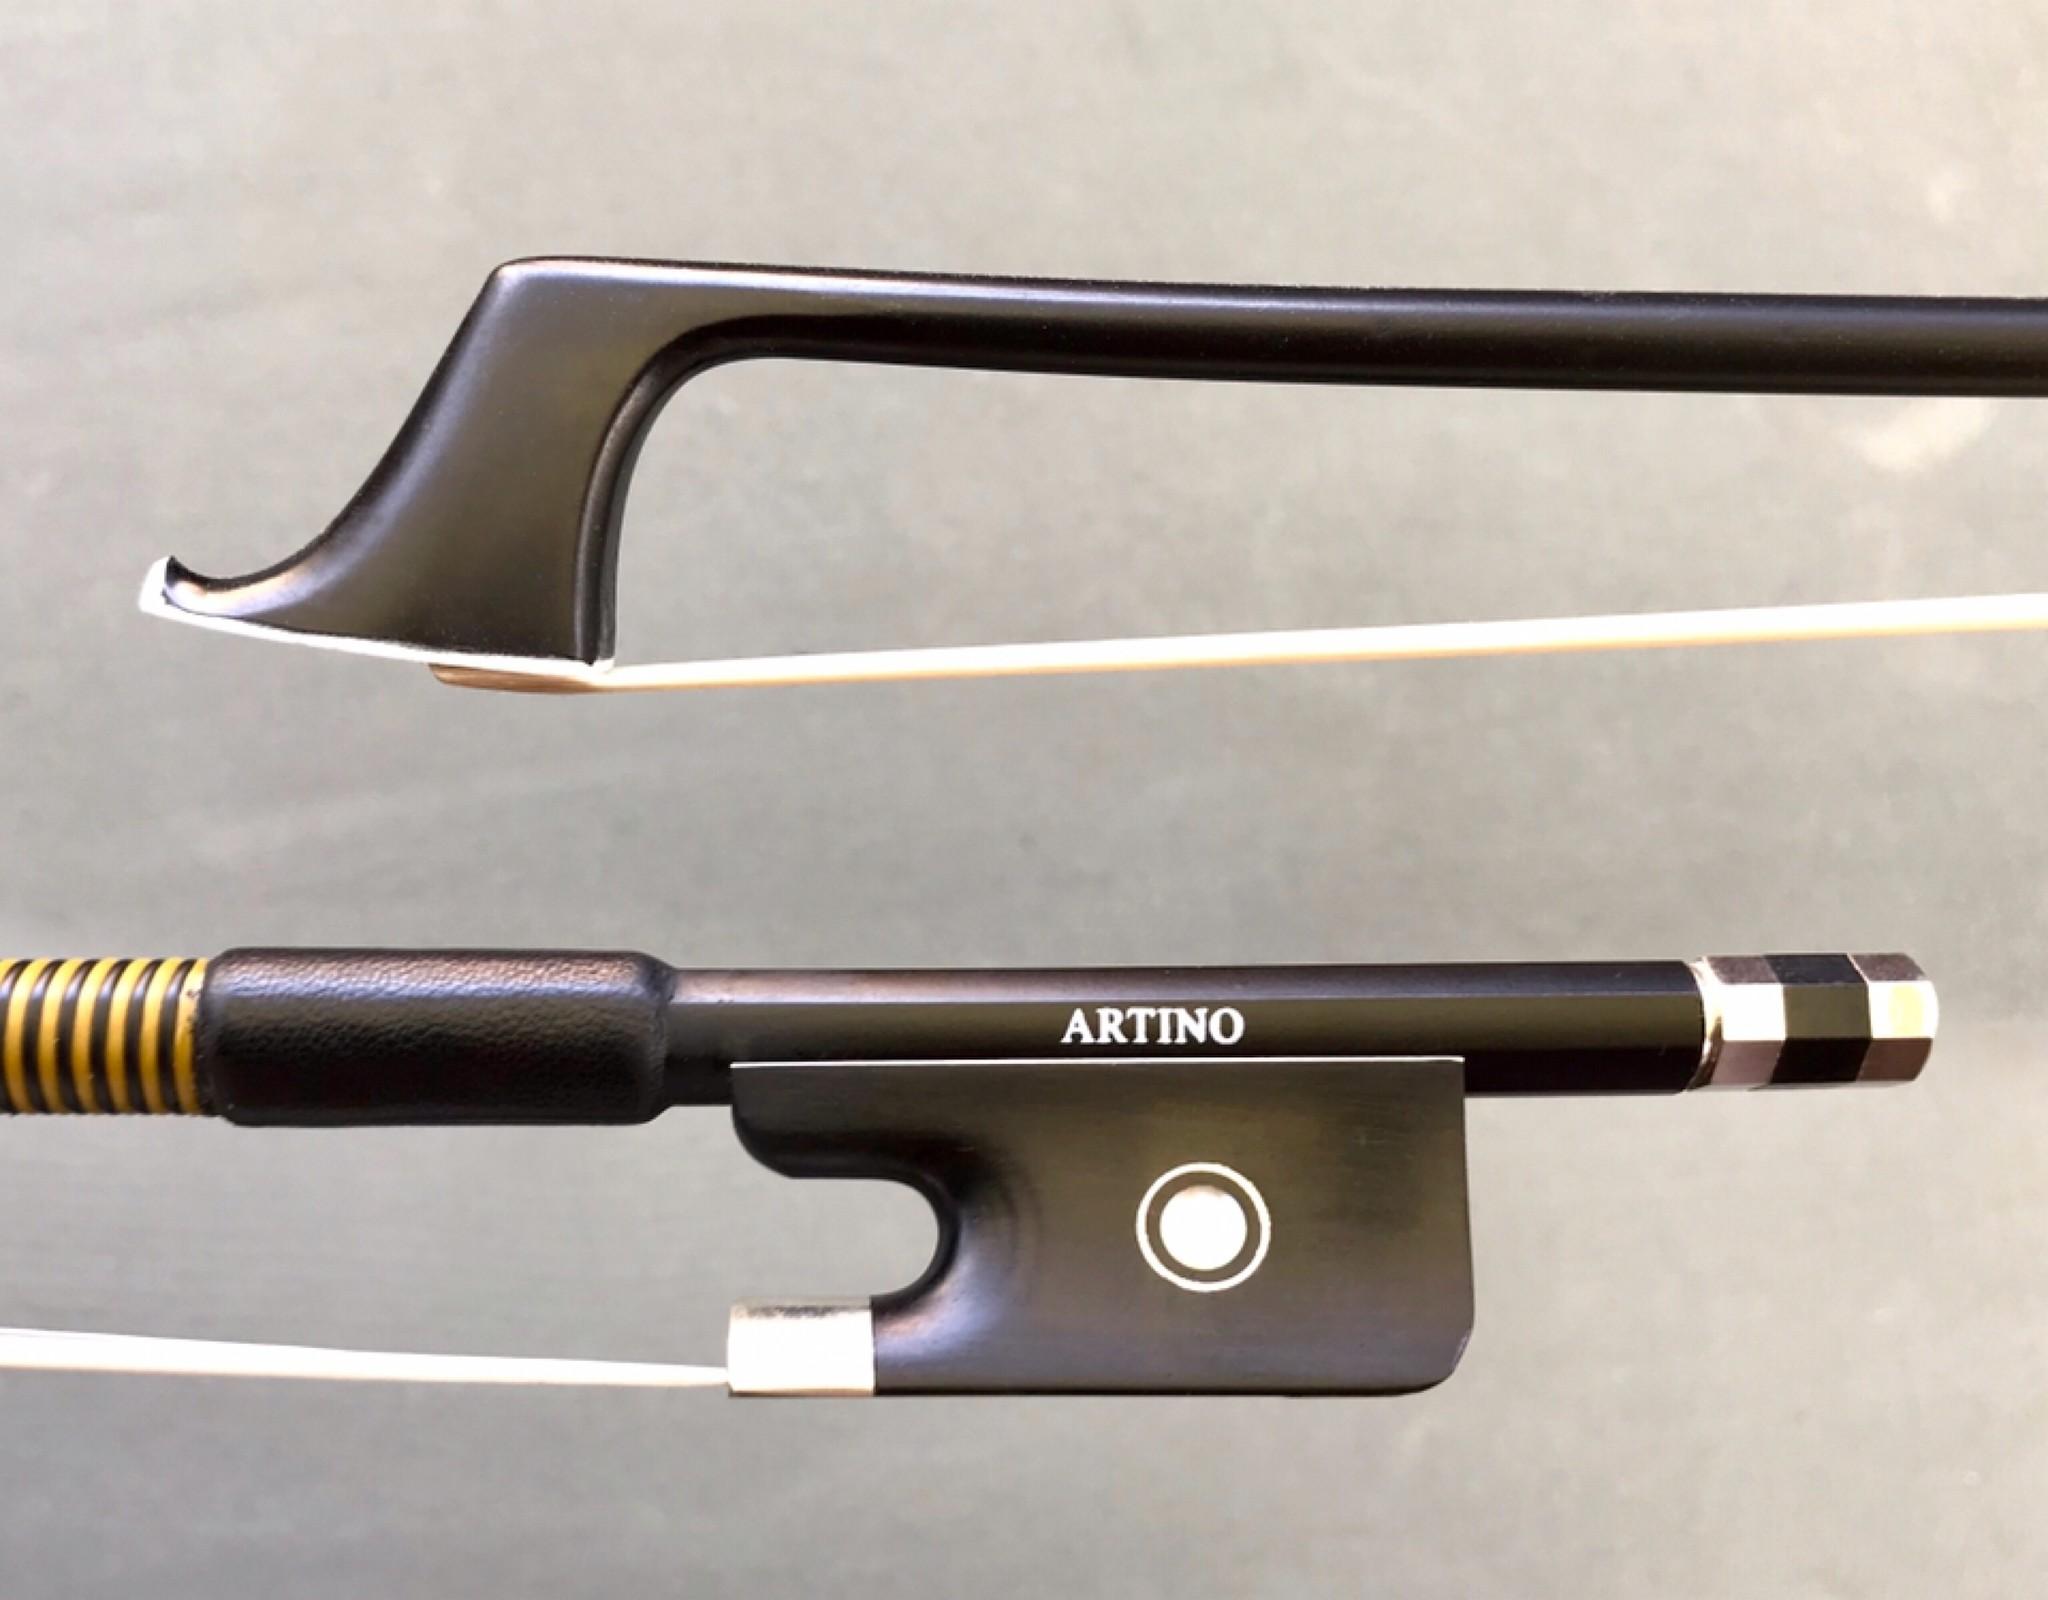 Artino Artino fiberglass cello bow, 3/4, horsehair